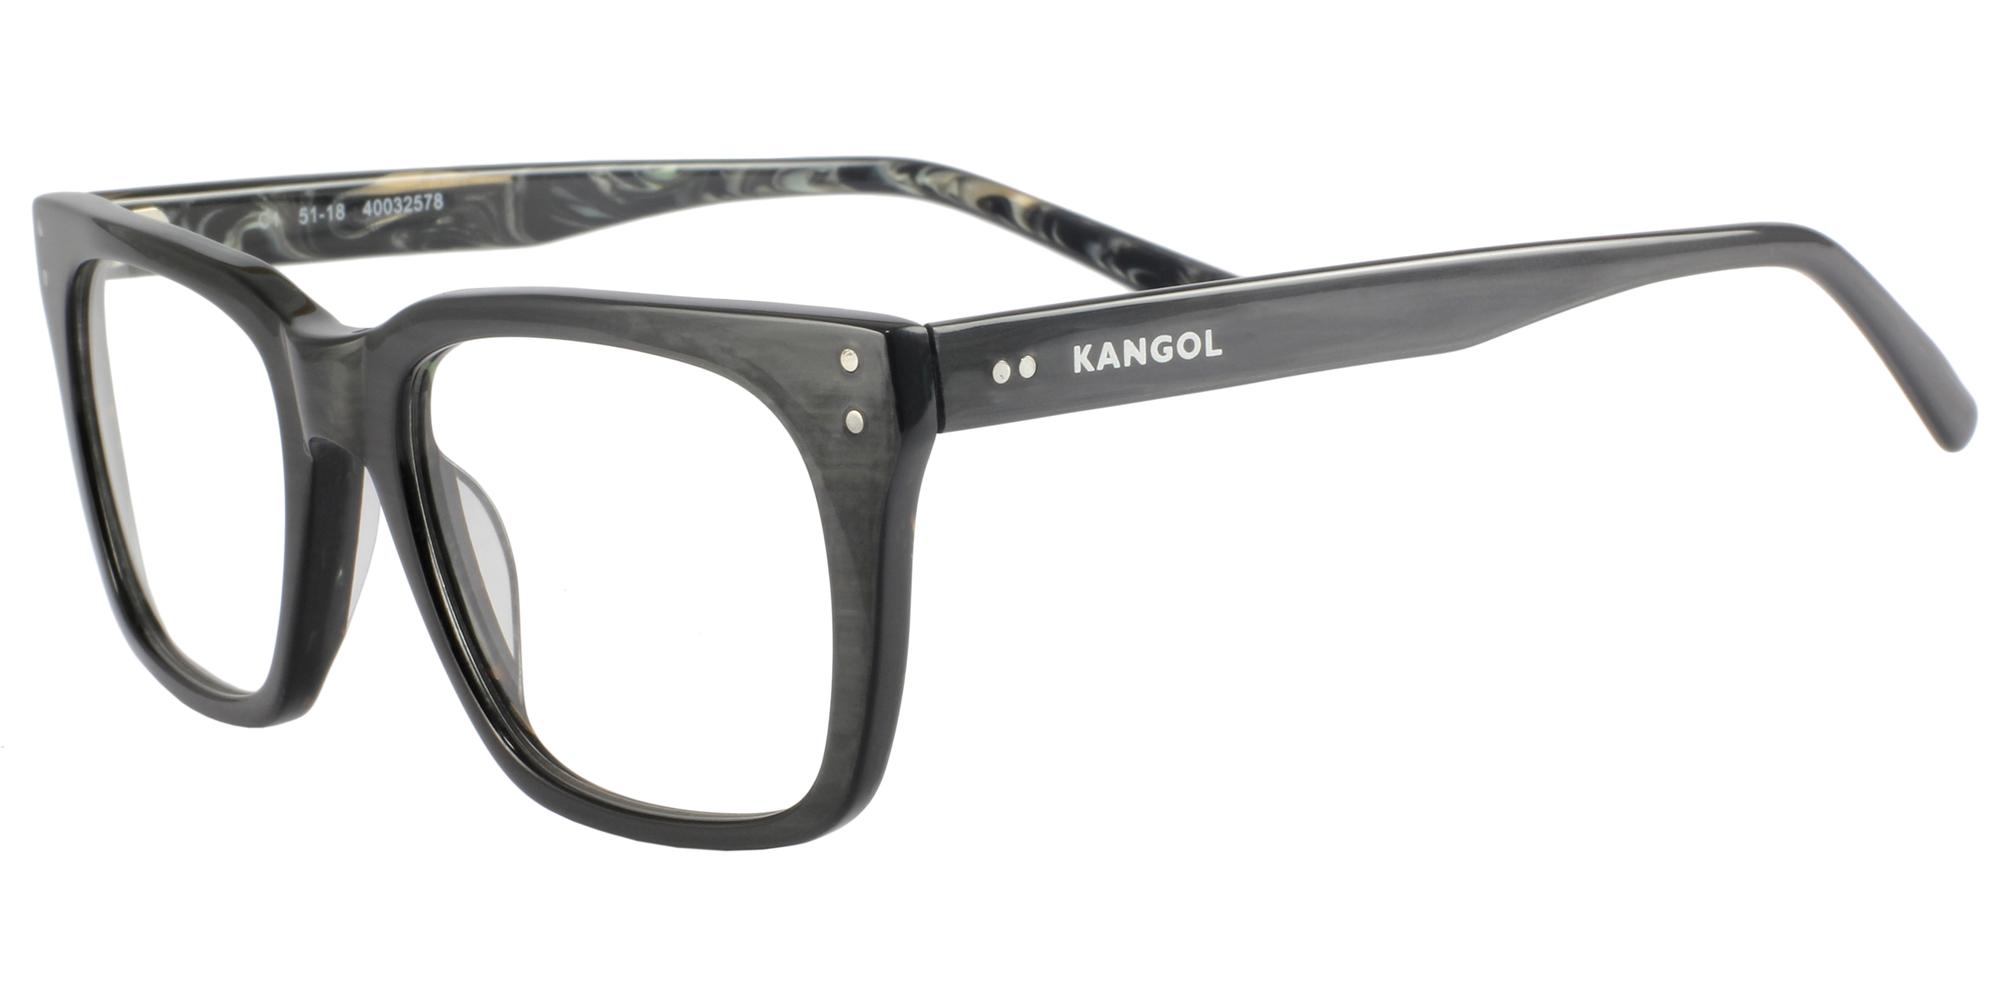 Kangol - 262